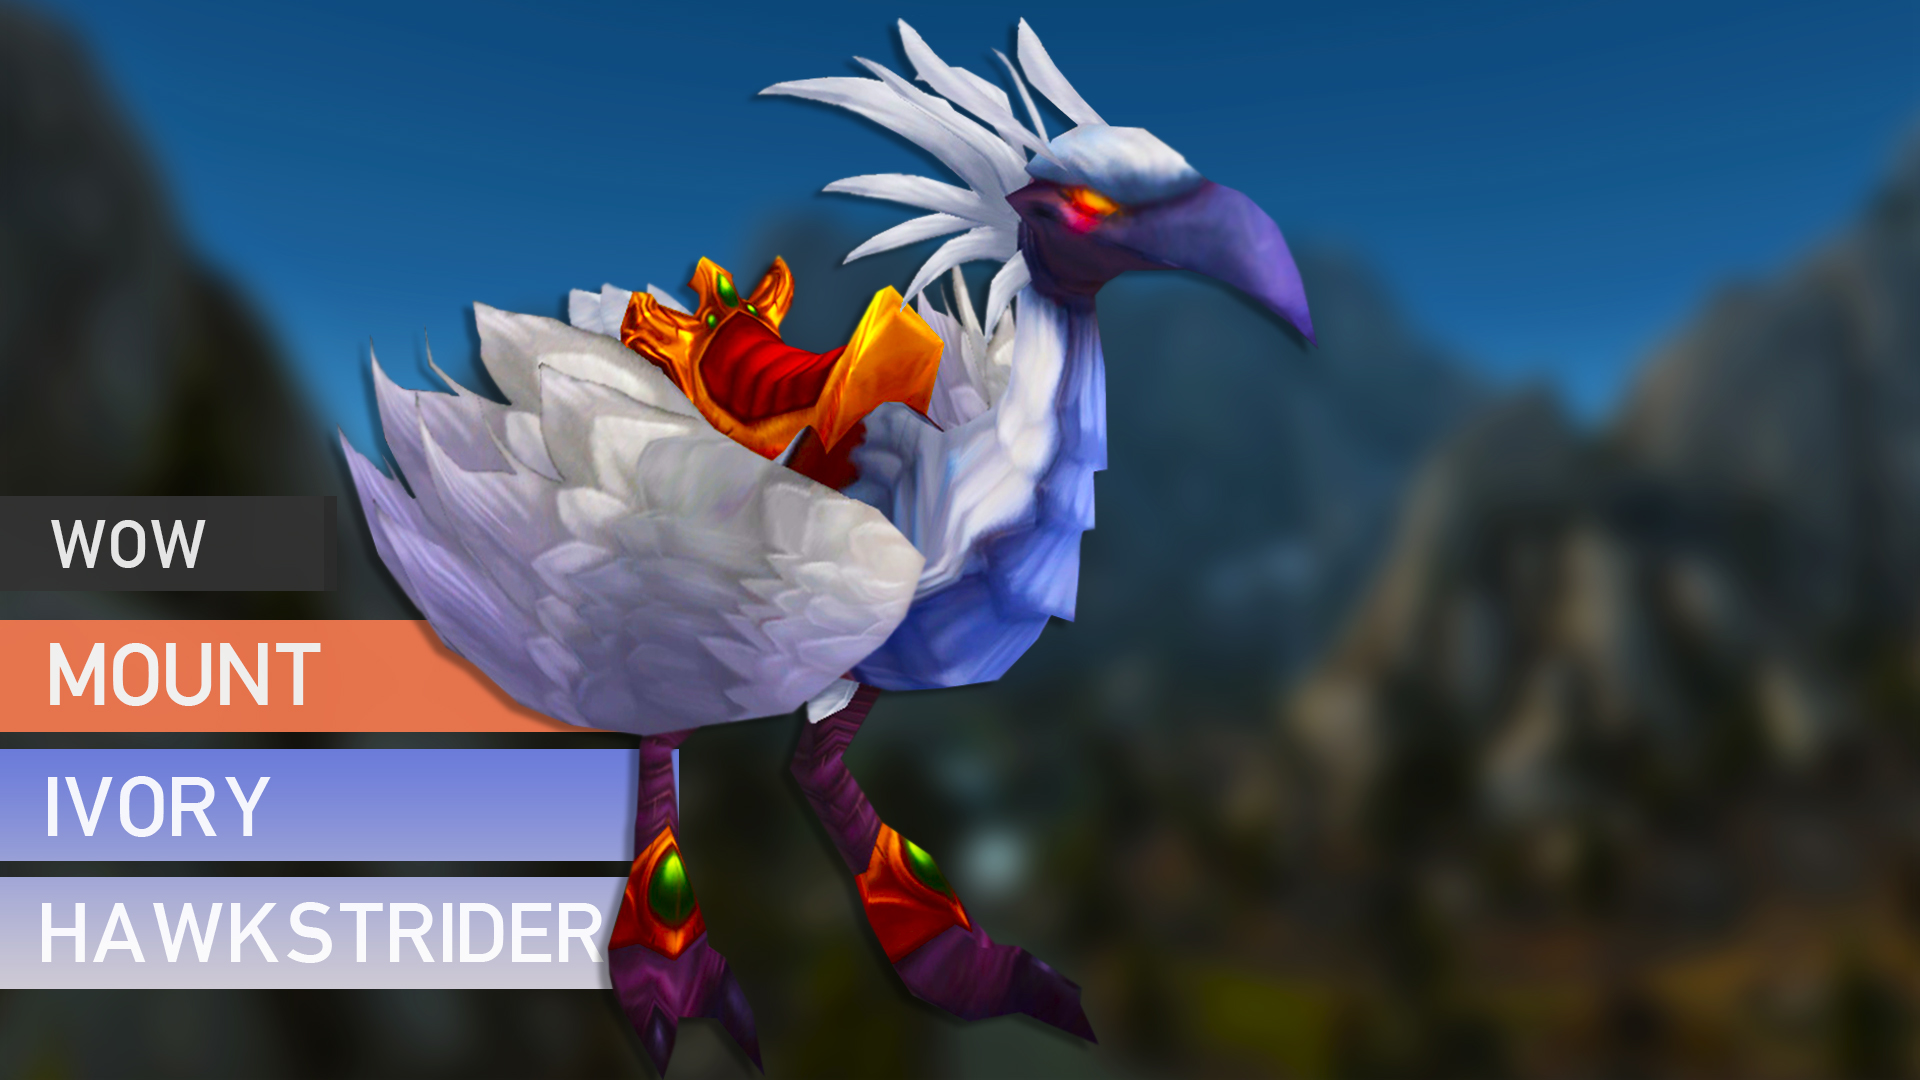 Ivory Hawkstrider Mount GBD - e2p.com